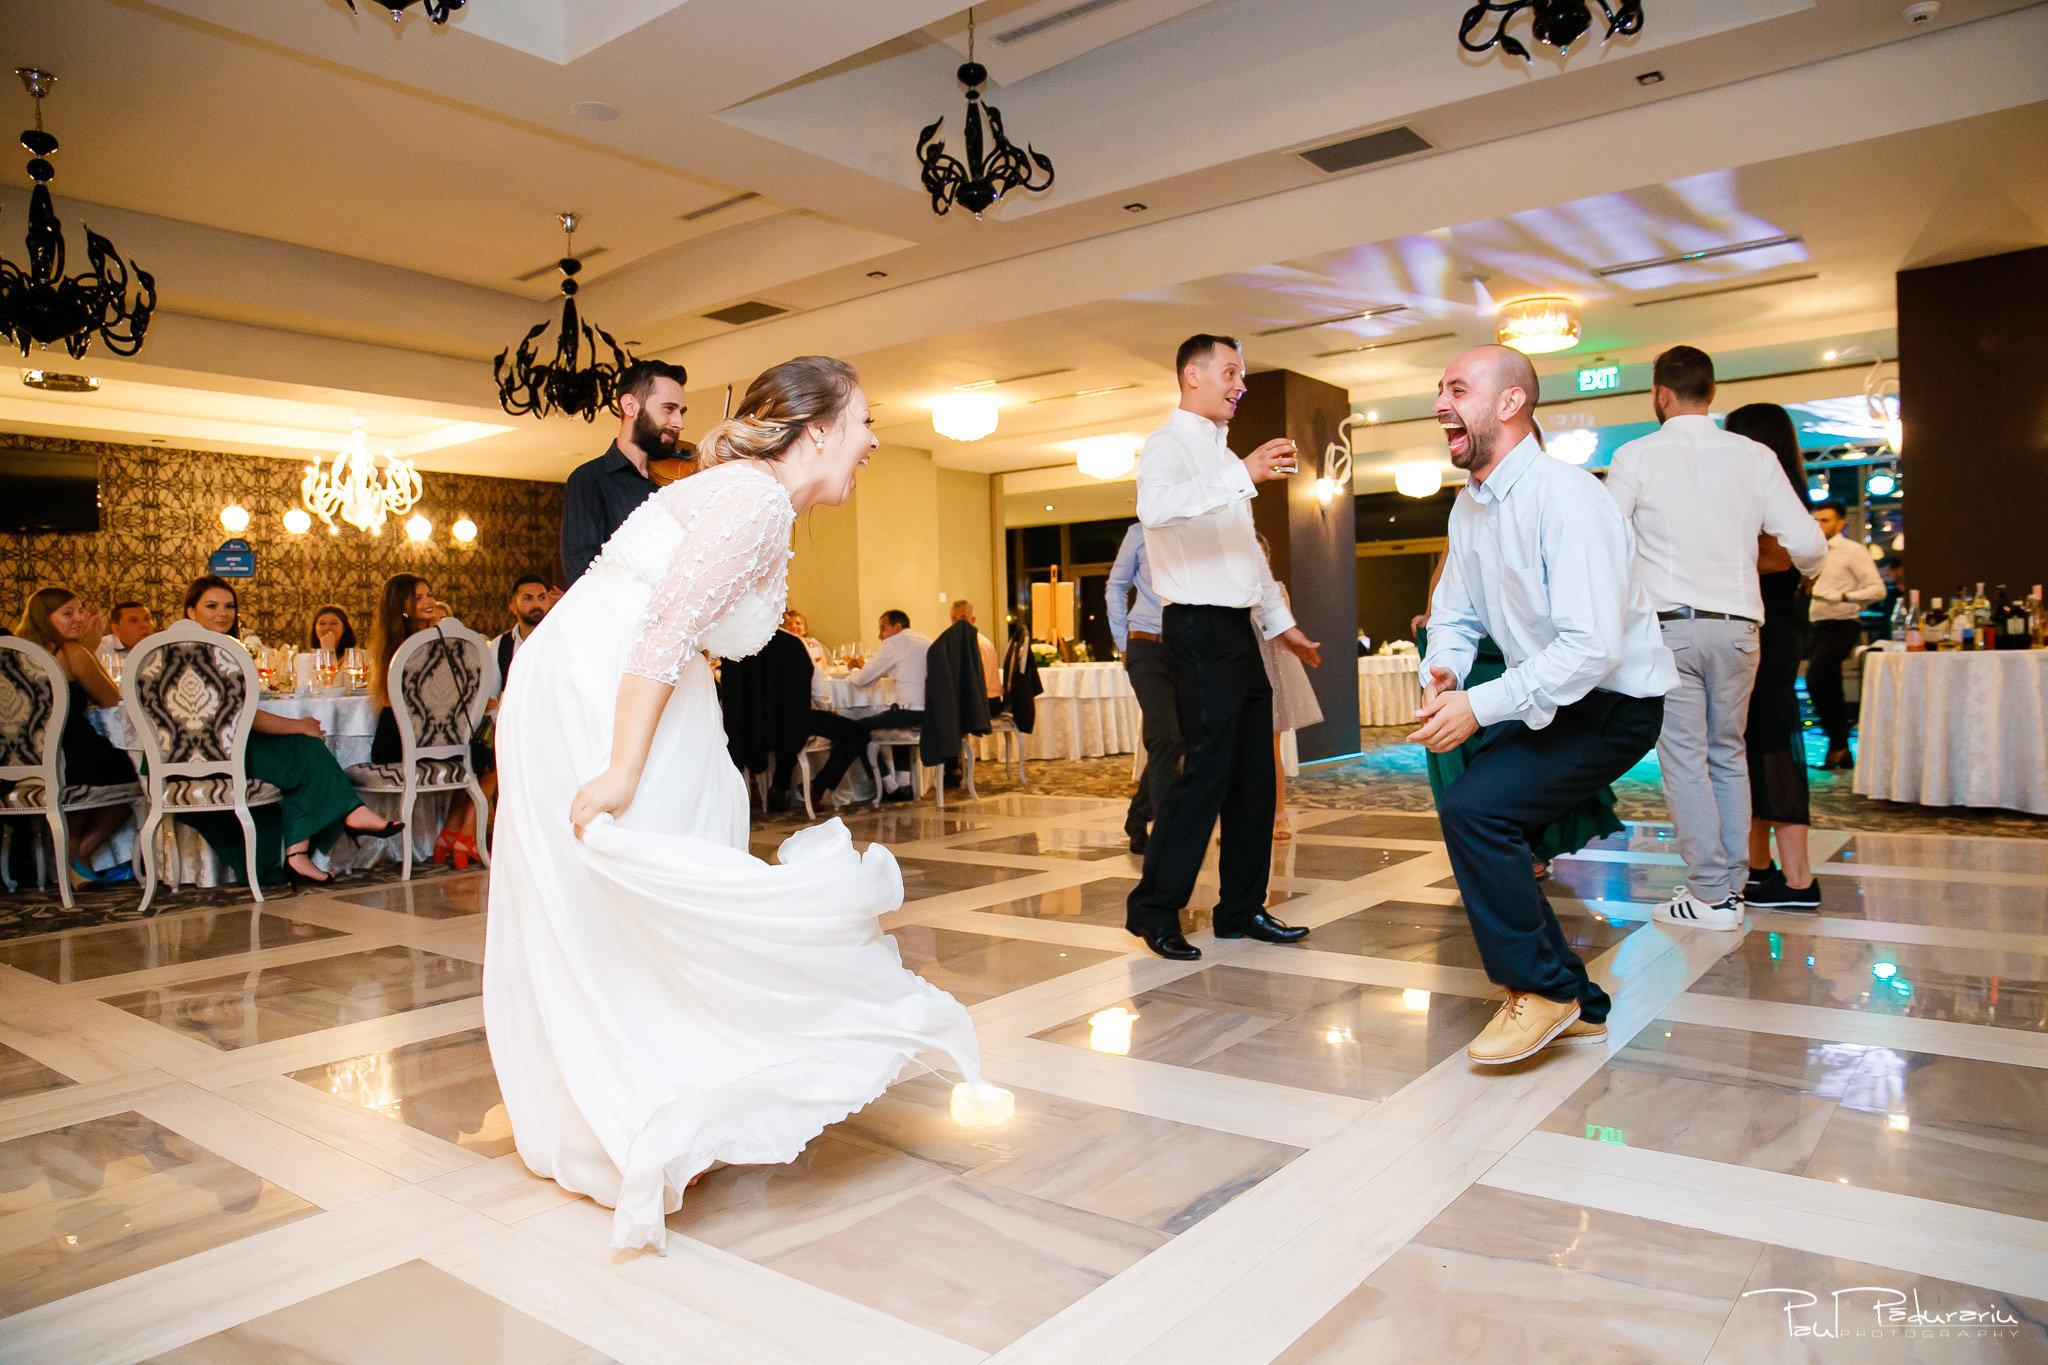 Petrecere la Pleaiada nunta Ema si Tudor fotograf profesionist de nunta iasi www.paulpadurariu.ro © 2017 Paul Padurariu momentul preferat al miresei dans alaturi de fratele sau